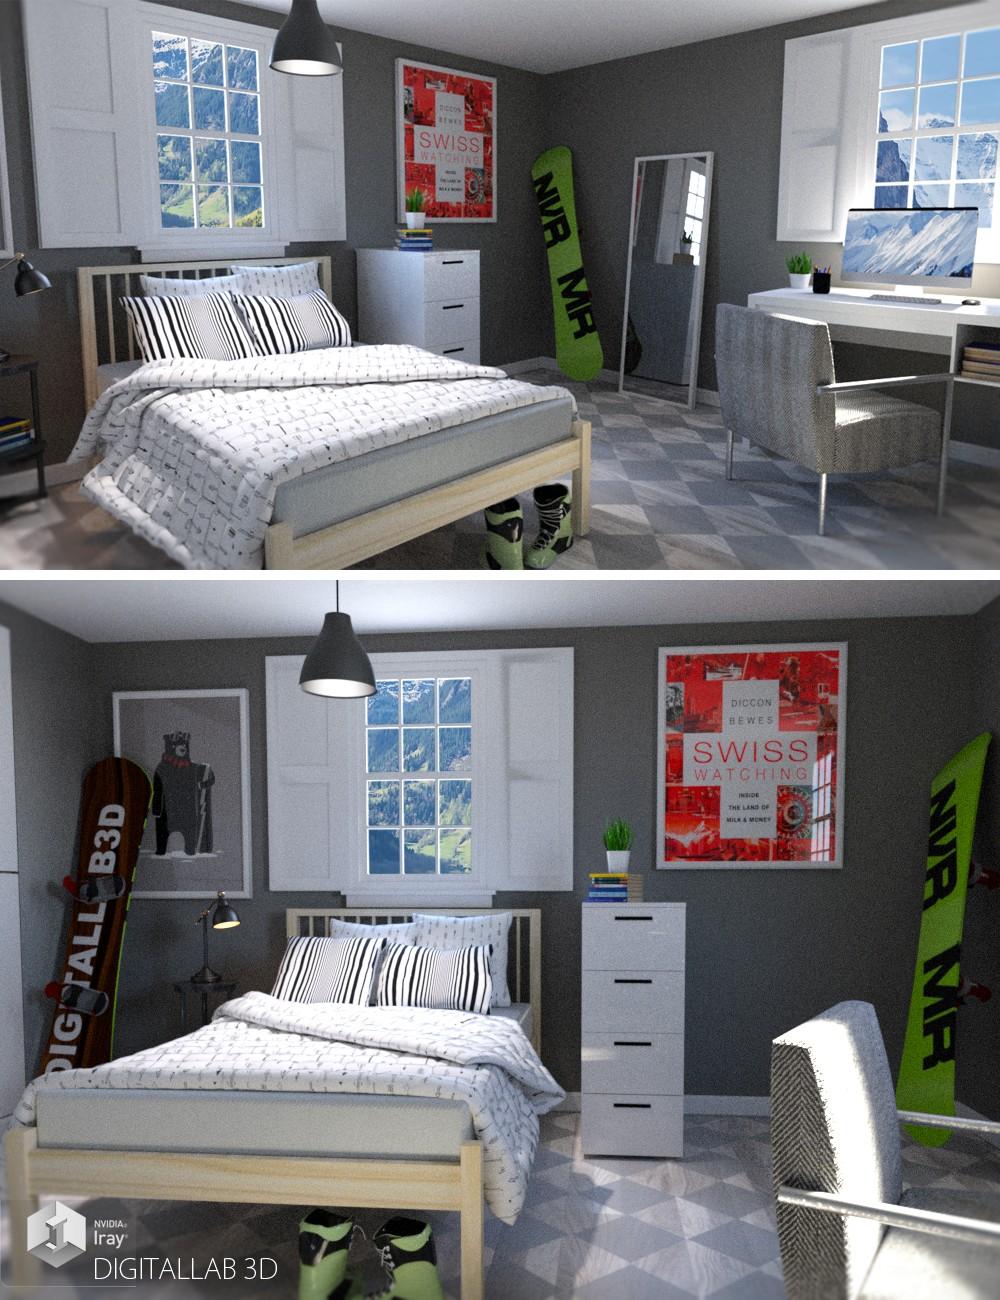 Download daz studio 3 for free daz 3d swiss room for Living room 2 for daz studio